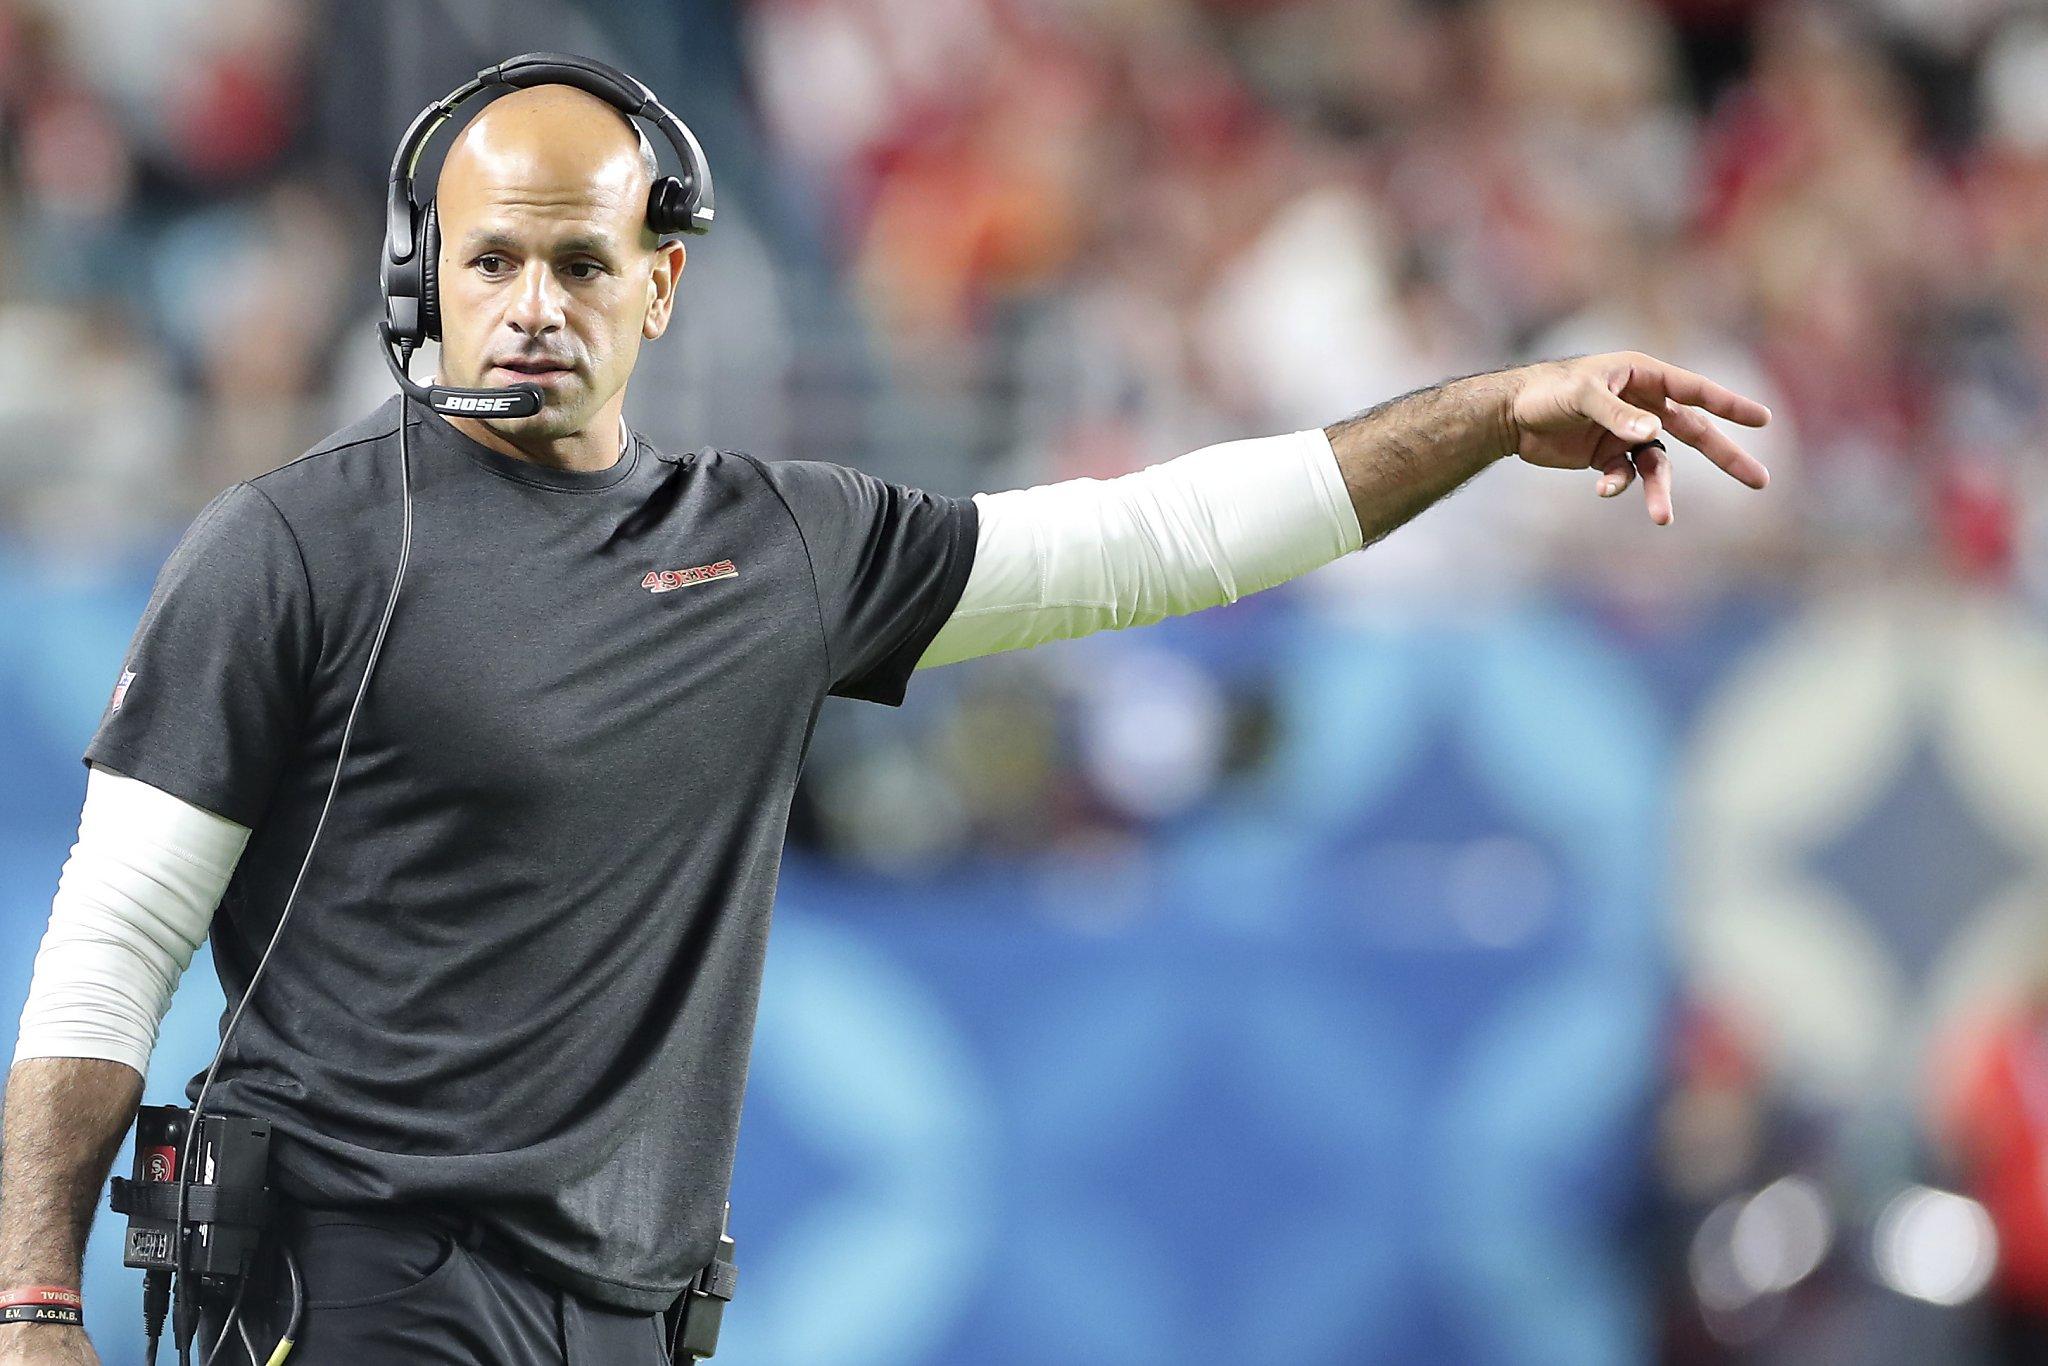 Report: 49ers' Robert Saleh declines Michigan State's interview request